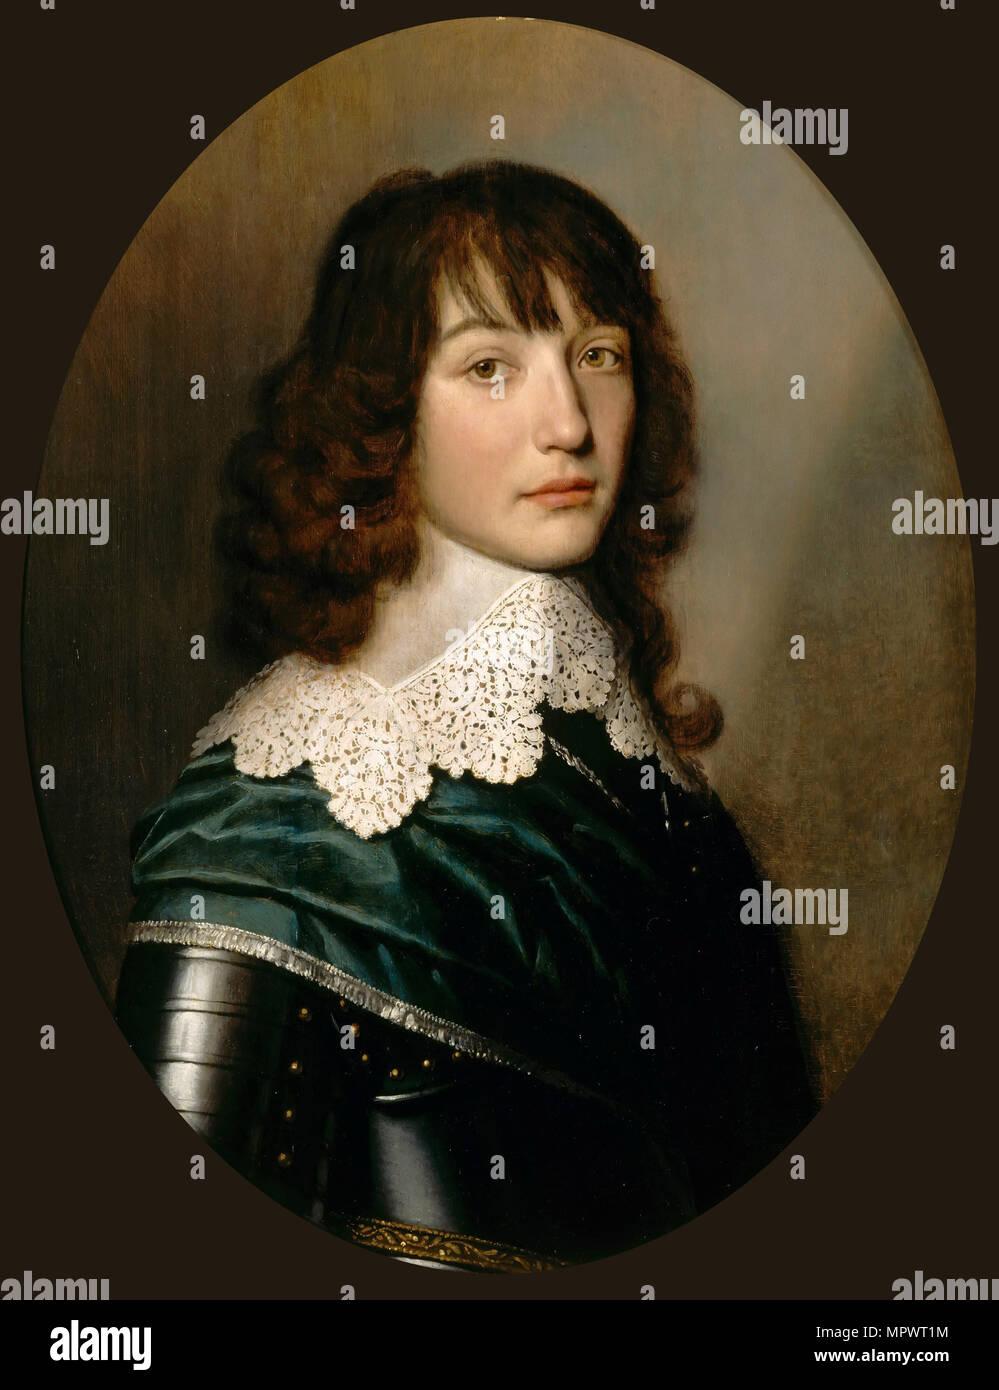 Portrait of Count Palatine Edward of Simmern (1625-1663), c. 1640. - Stock Image